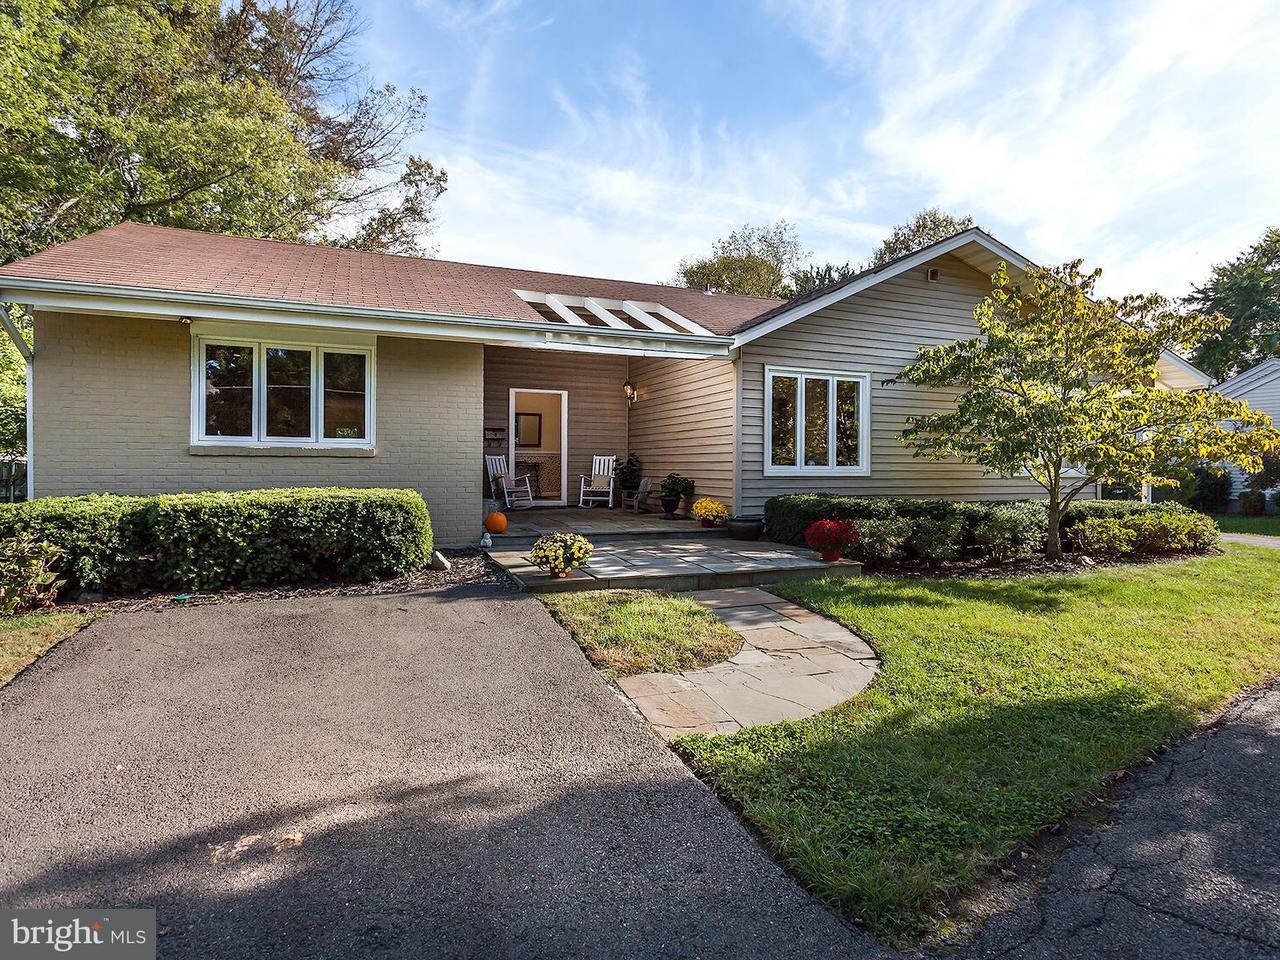 Single Family Home for Sale at 2407 WITTINGTON BLVD 2407 WITTINGTON BLVD Alexandria, Virginia 22308 United States